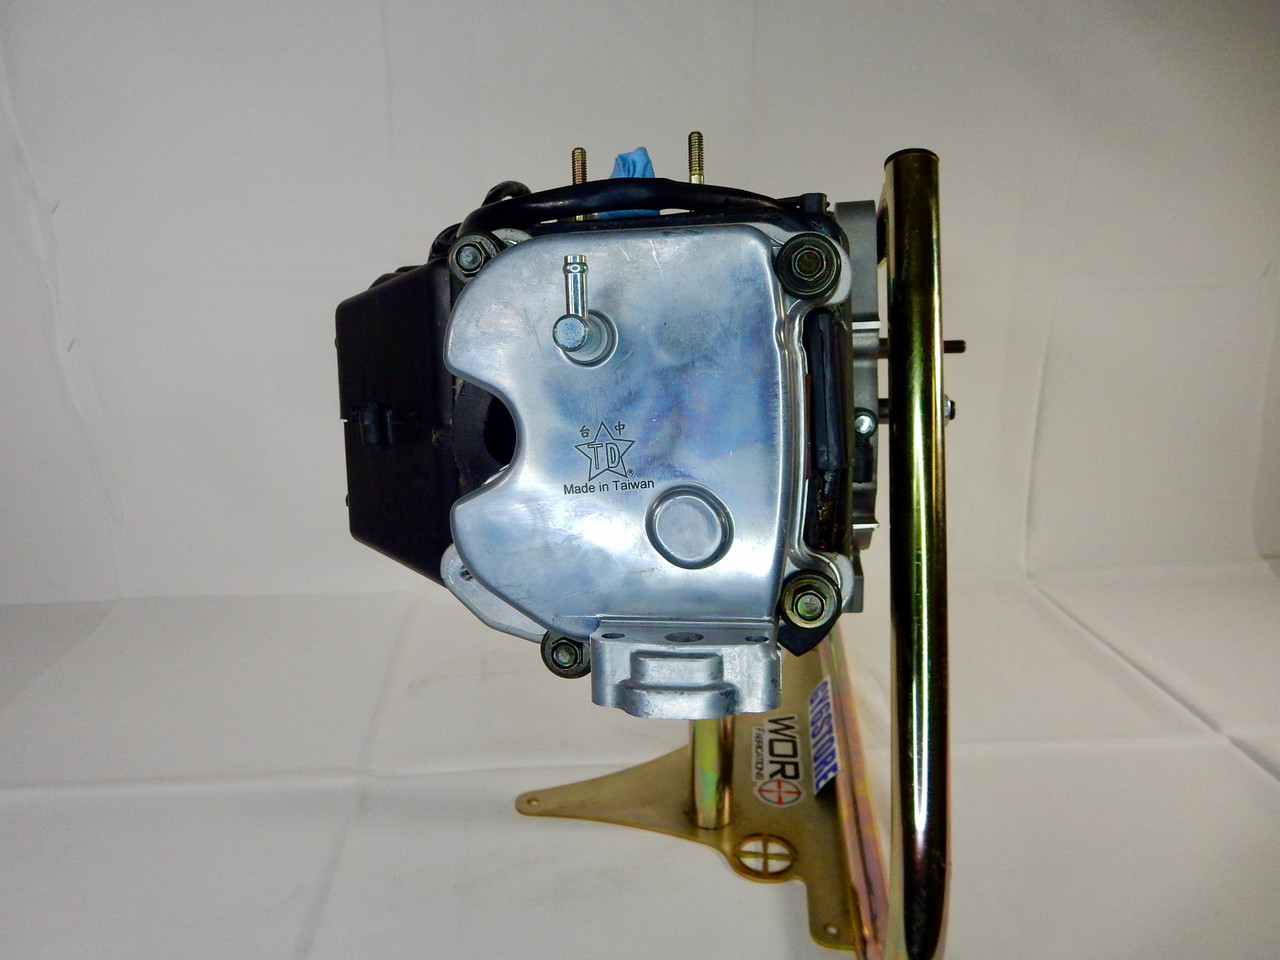 TAIDA 232cc (67mm BORE) *4V* LONG CASE B-BLOCK COMPLETE ENGINE